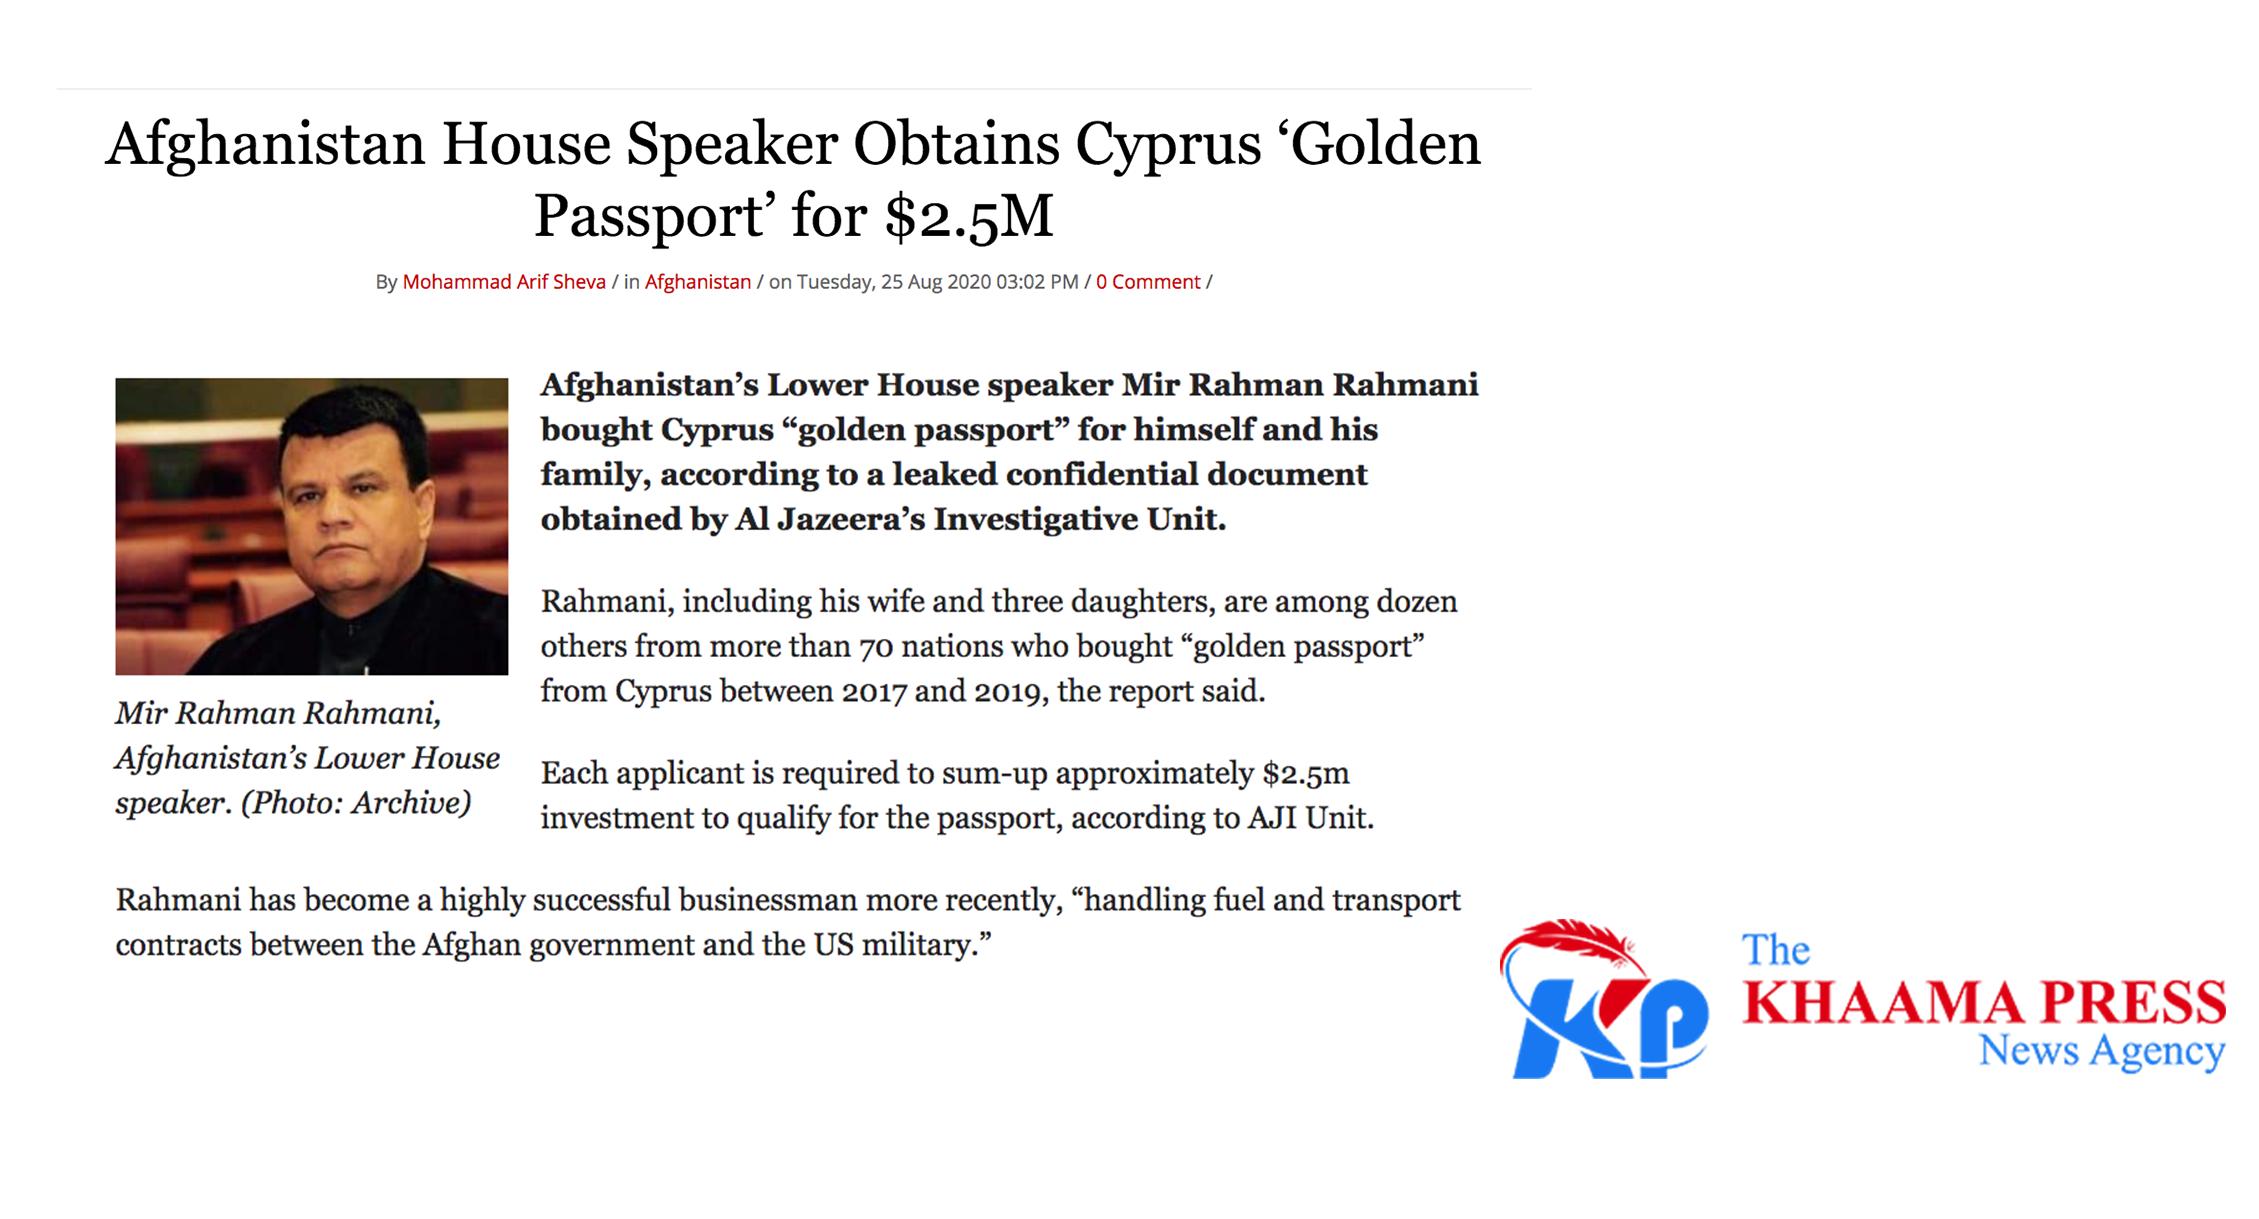 Khaama Press: Afghanistan House Speaker Obtains Cyprus 'Golden Passport' for $2.5M